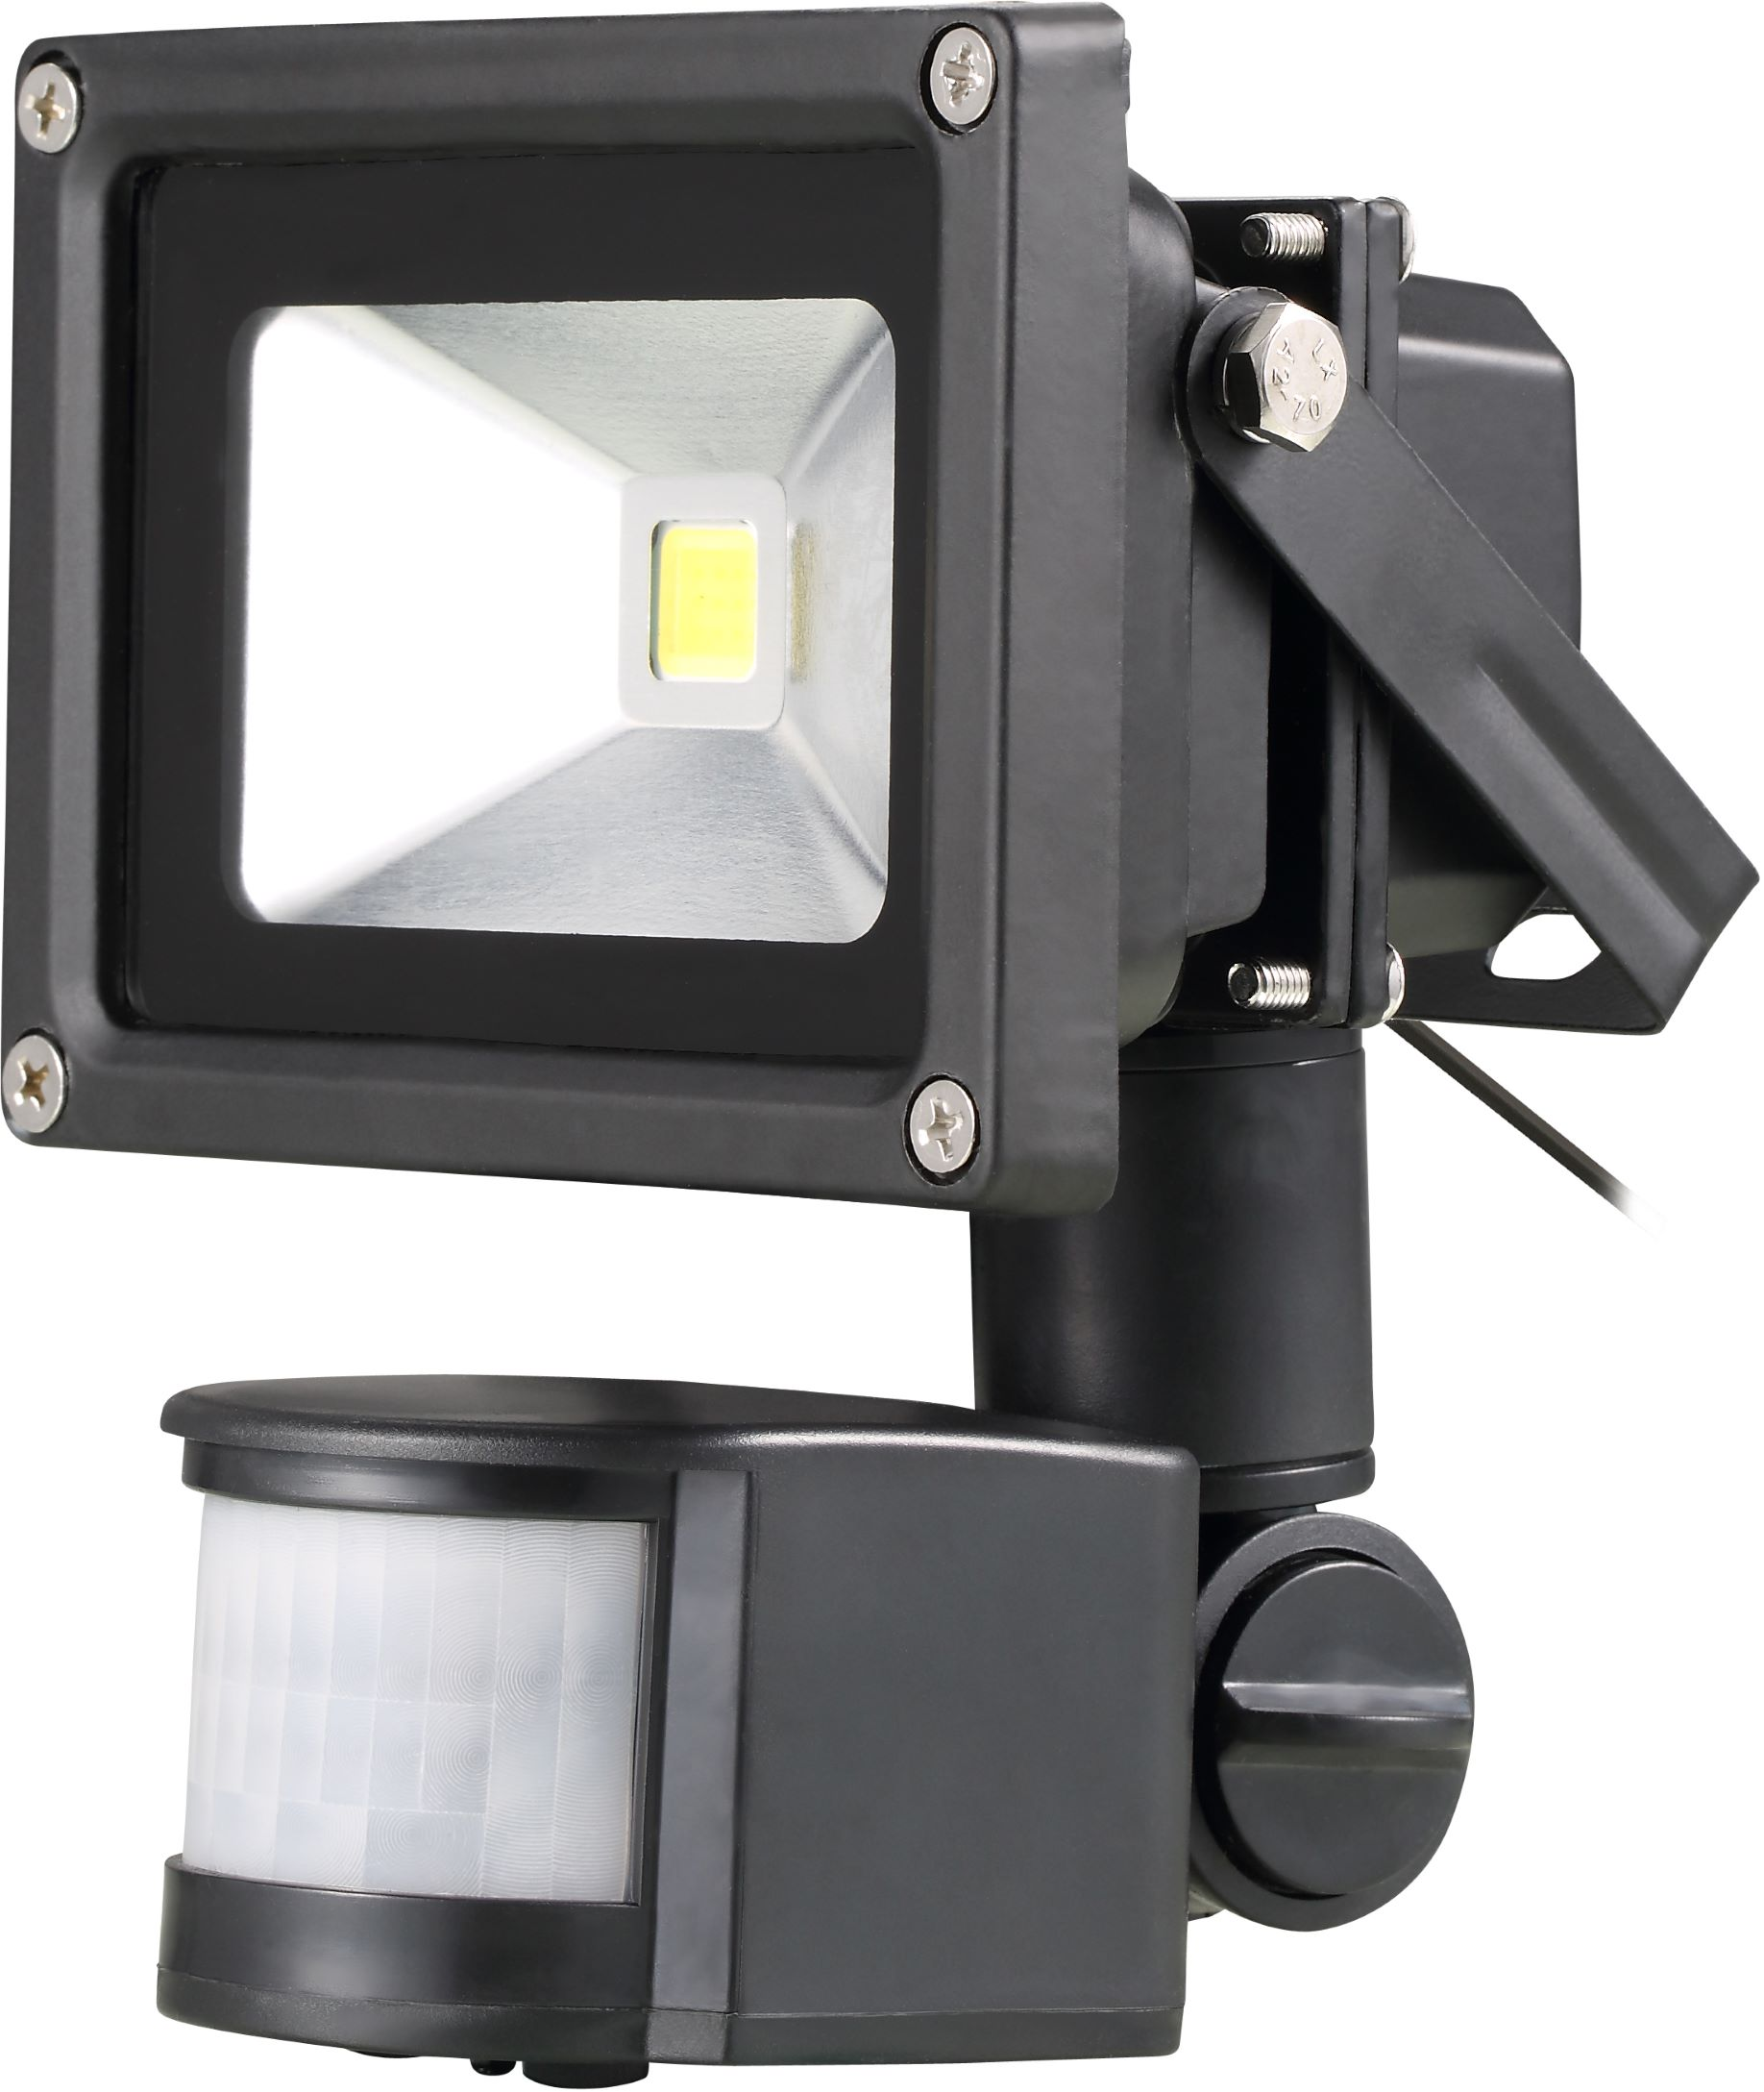 NORDRIDE 4065 Flutlichtstrahler 10W mit